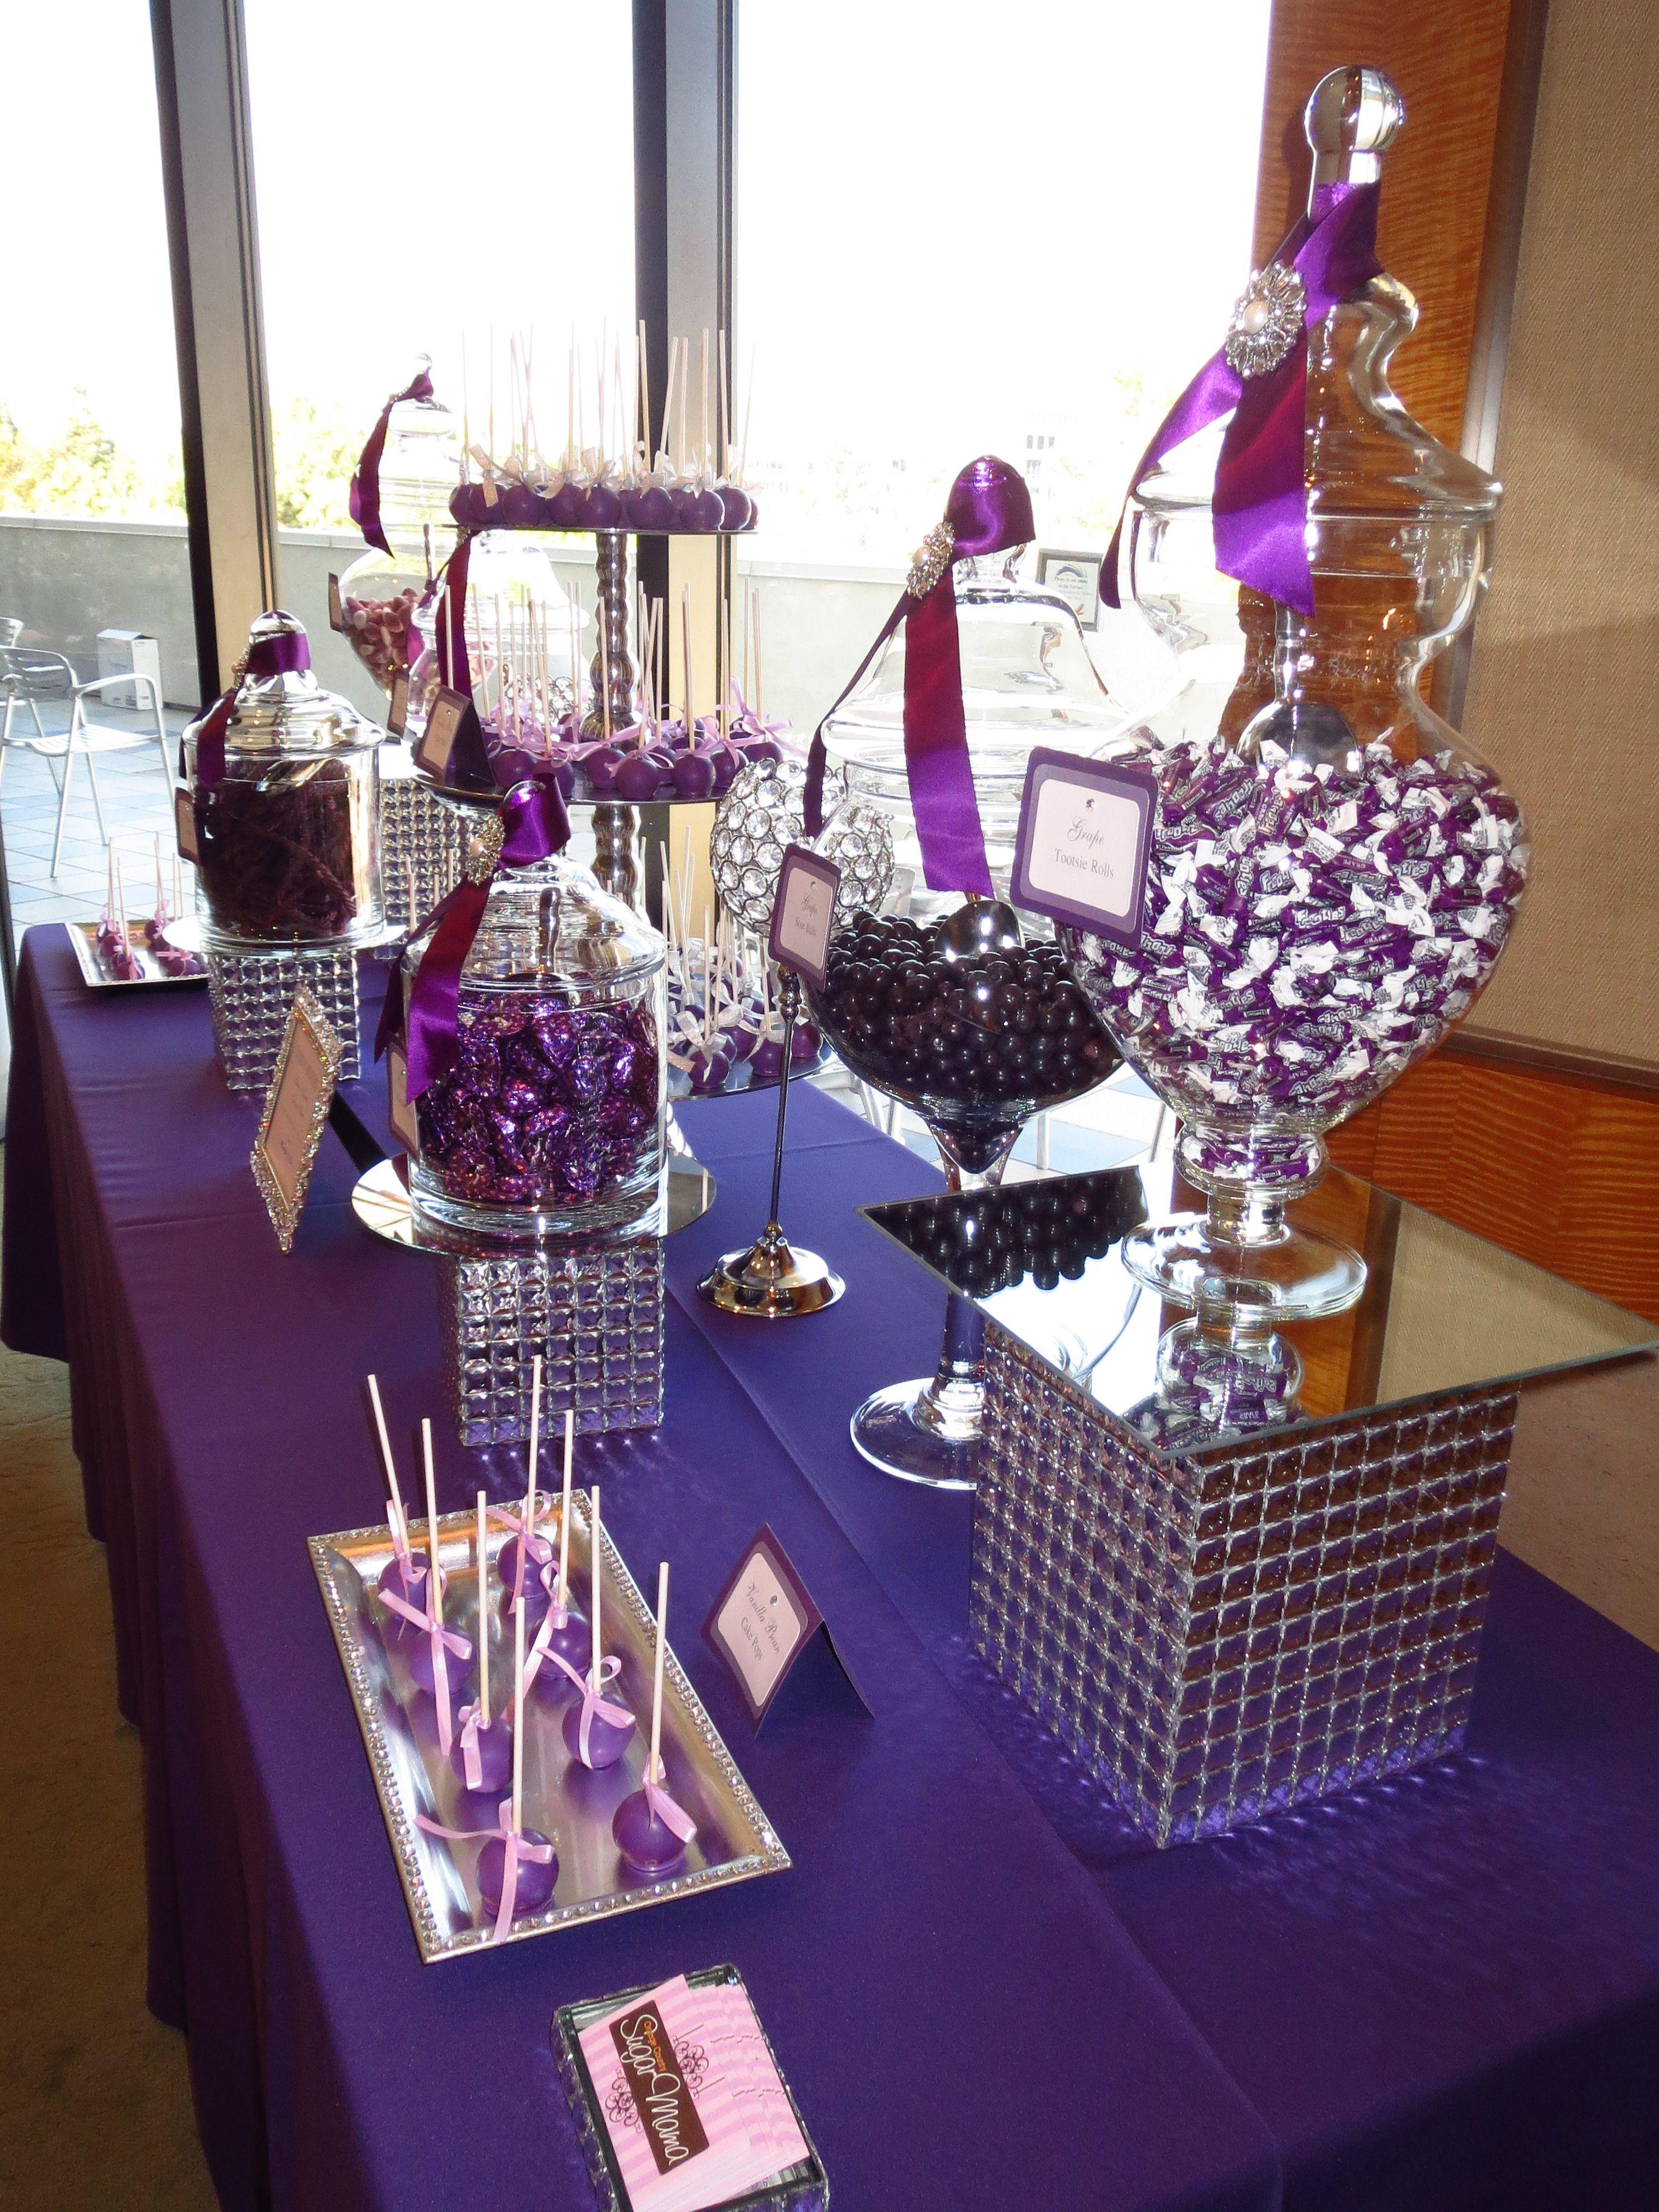 Pin By Oc Sugar Mama On Purple Candy Dessert Table Purple Candy Table Candy Table Decorations Wedding Candy